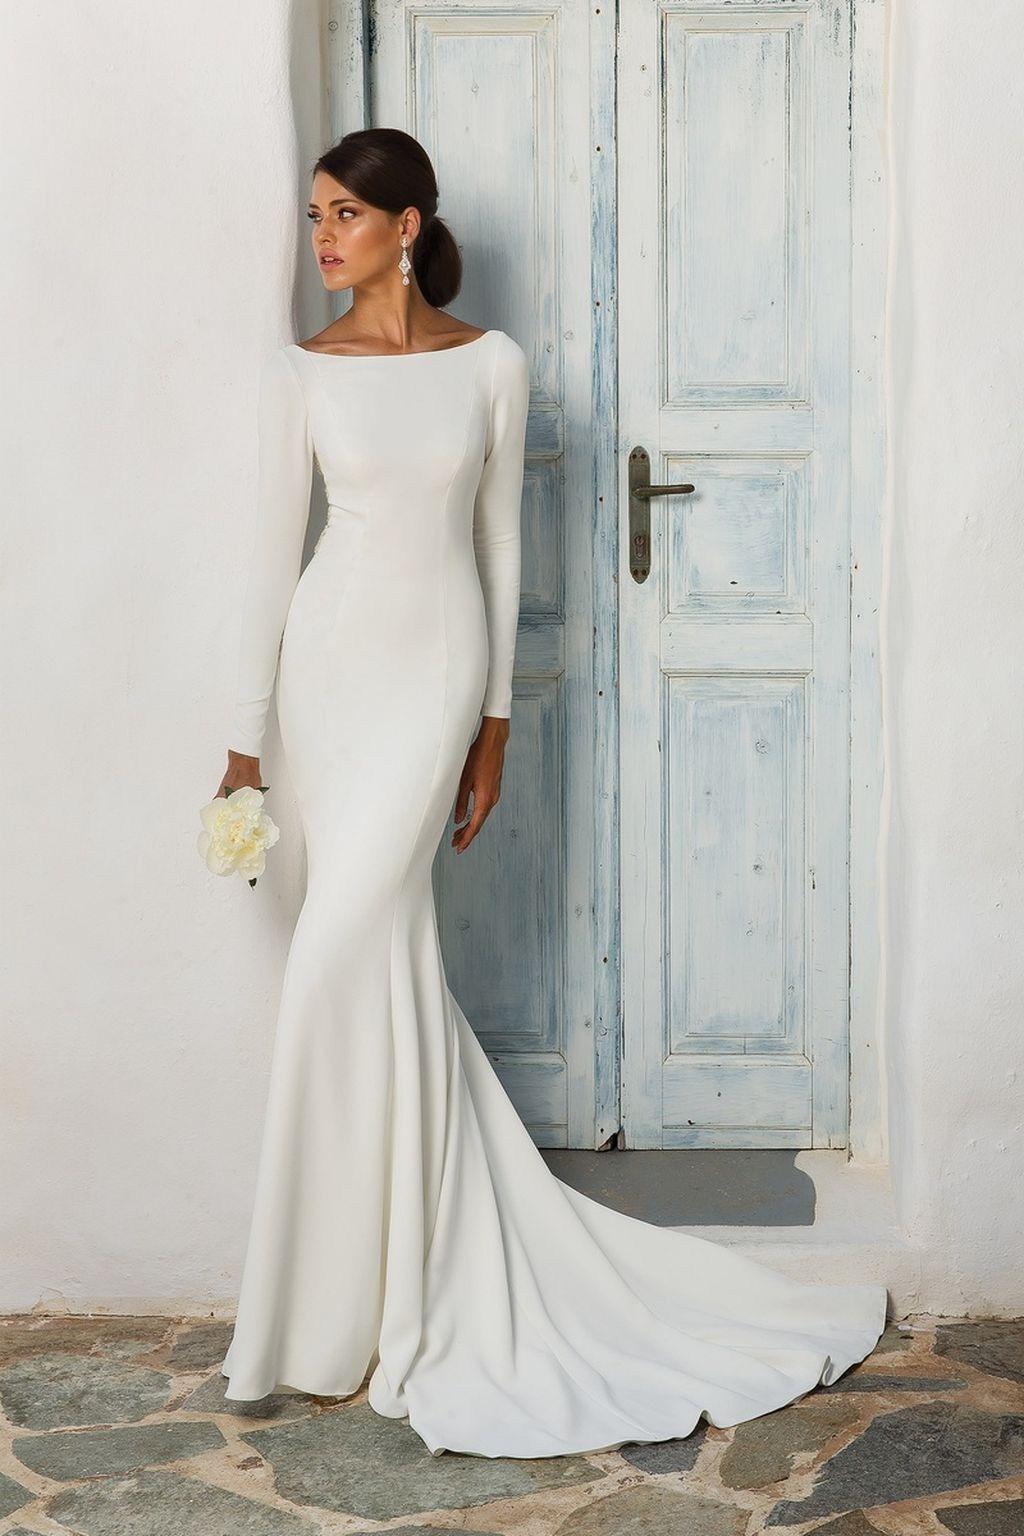 Totally Adorable Long Sleeve Winter Wedding Dress Ideas